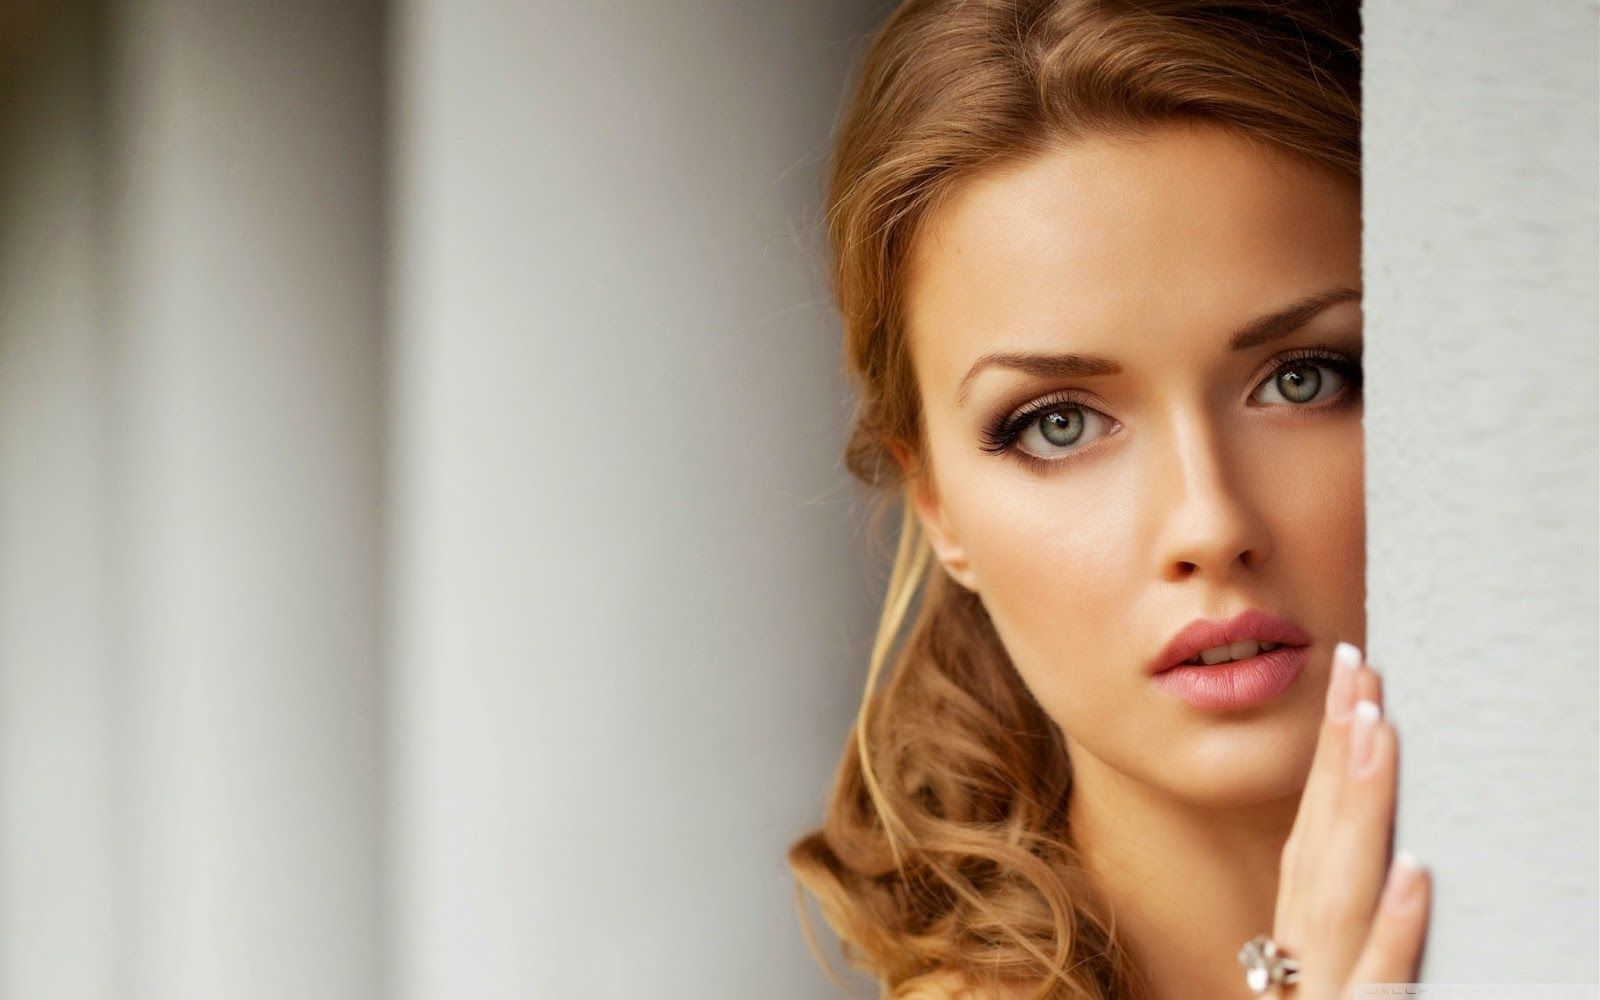 Plus Belle Femme Du Monde Sans Maquillage جمالك1 مشاكل البشرة الحساسة وطرق التعامل معها Beautiful Girl Face Beautiful Girl Hd Wallpaper Beautiful Girl Wallpaper